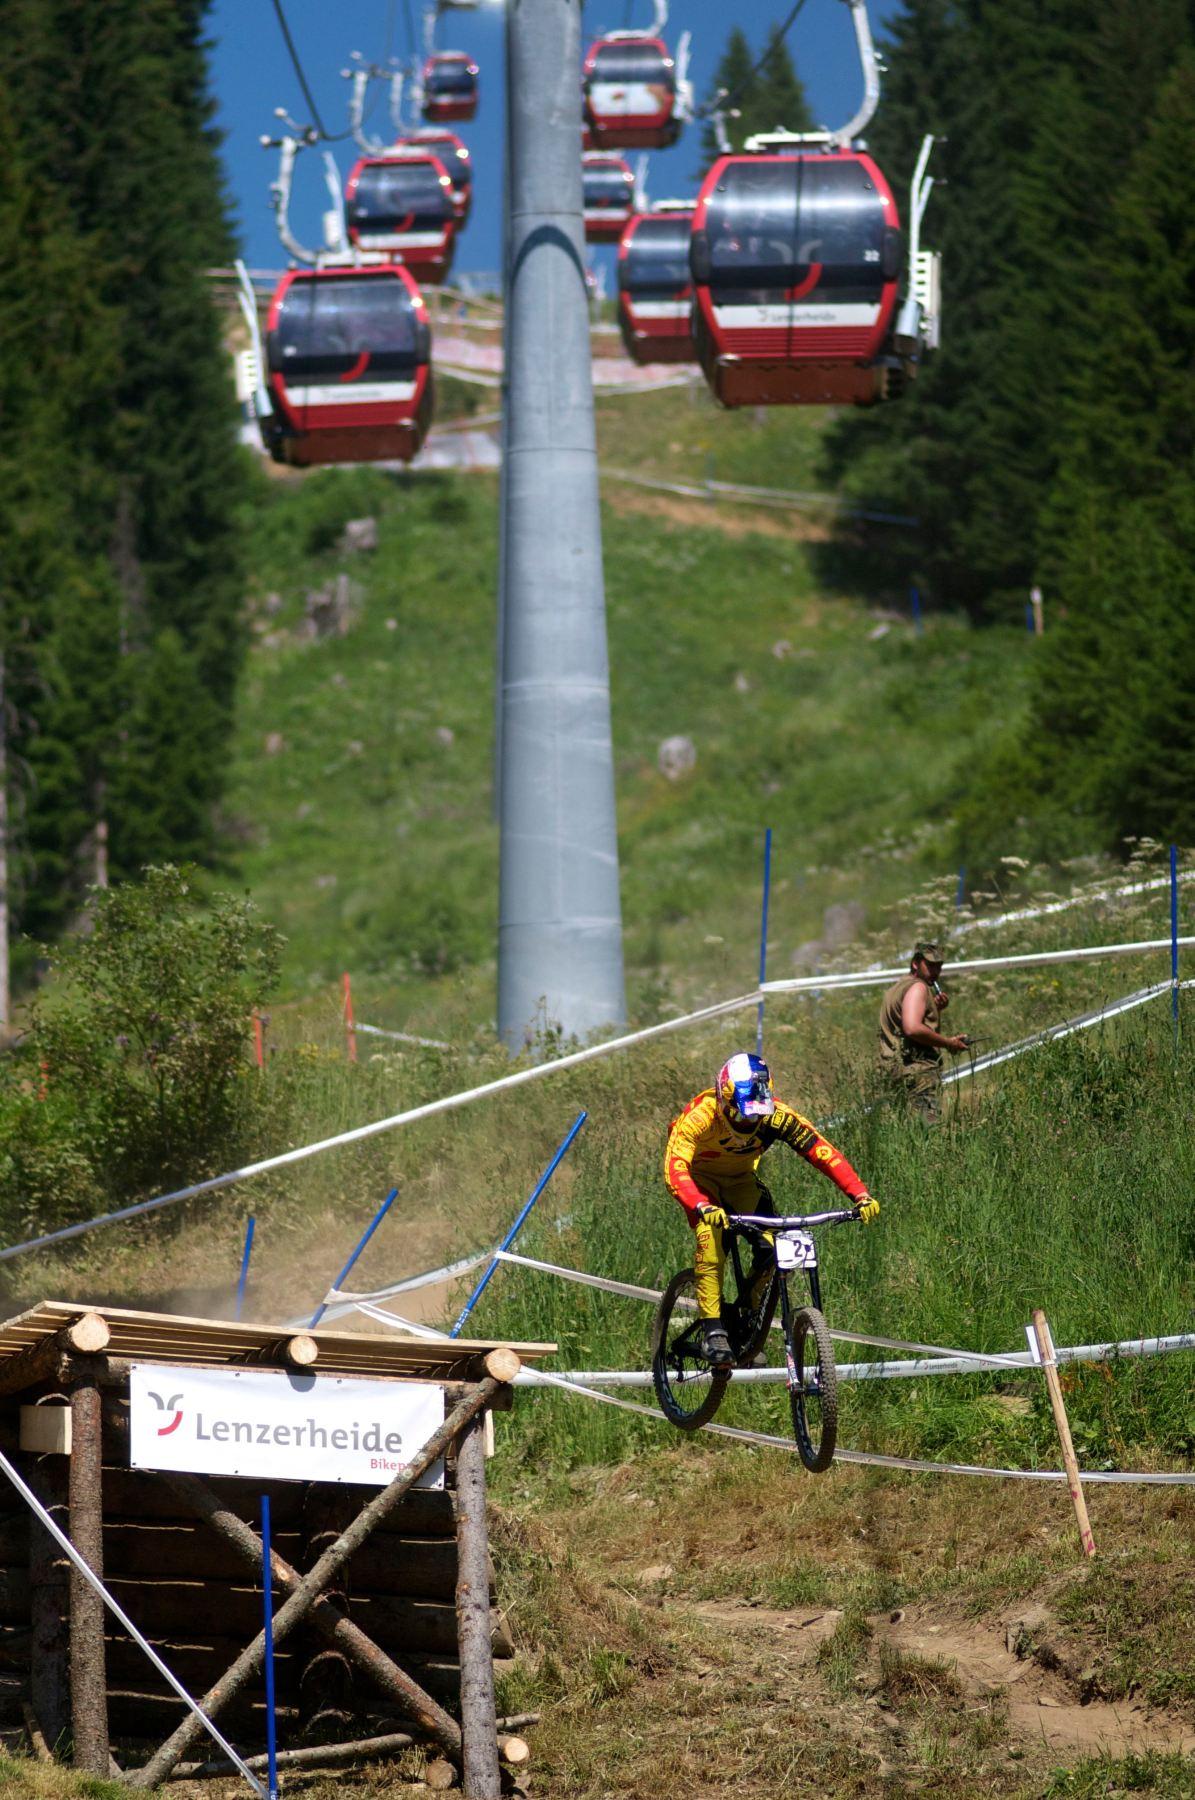 loic bruni uci downhill lenzerheide 2015 drop